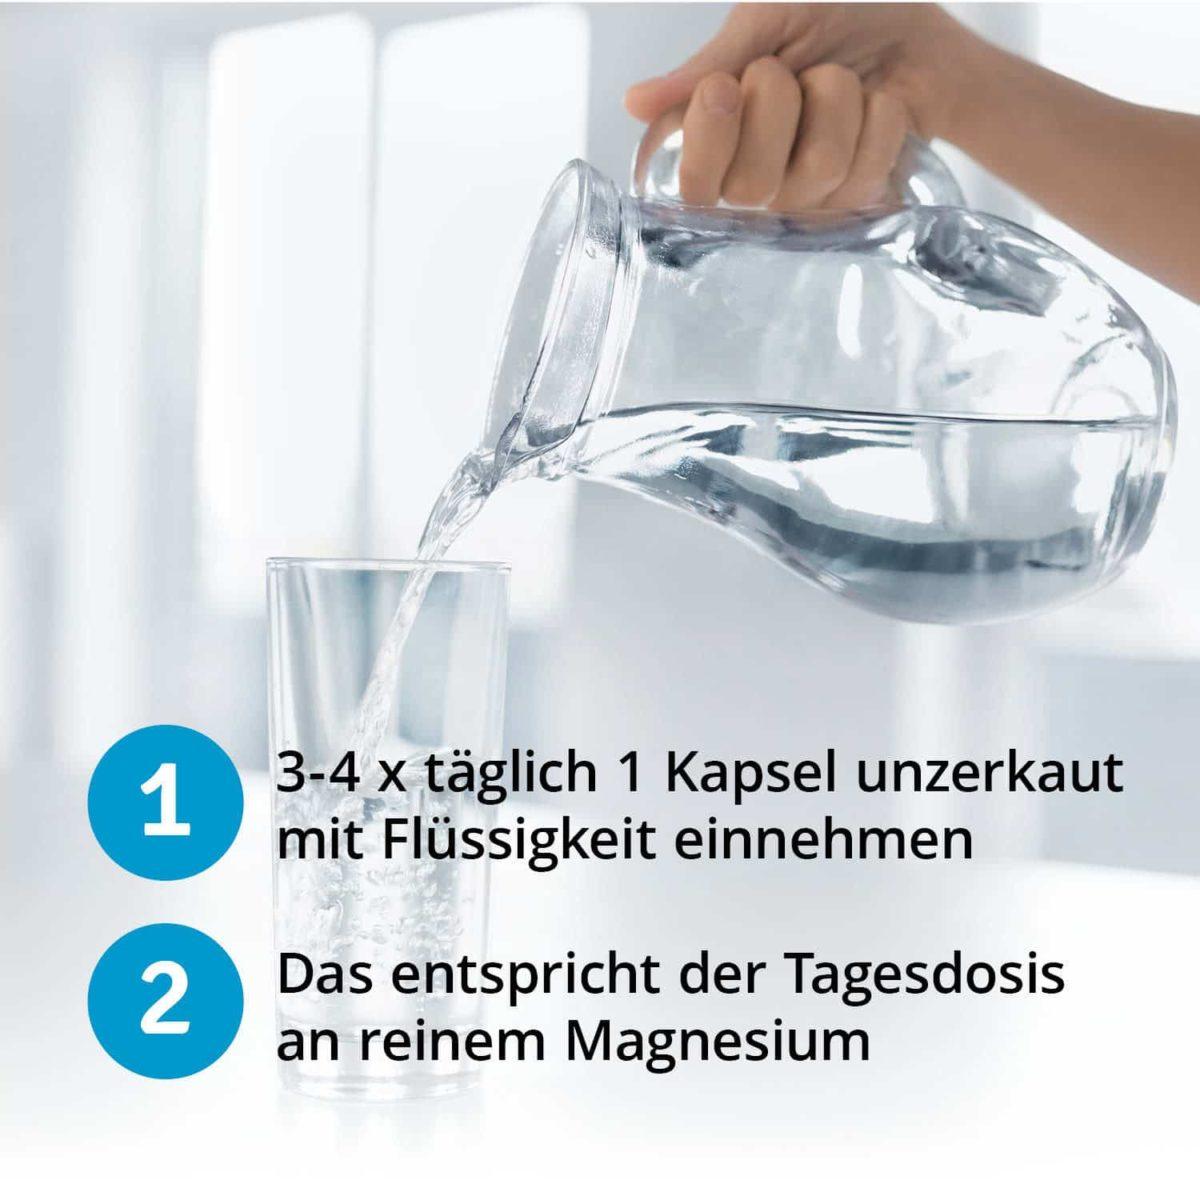 Casida Magnesiumcitrat Kapseln Vital – 120 Stk. 14362474 PZN Apotheke Muskelkater Muskelkrampf Sport6